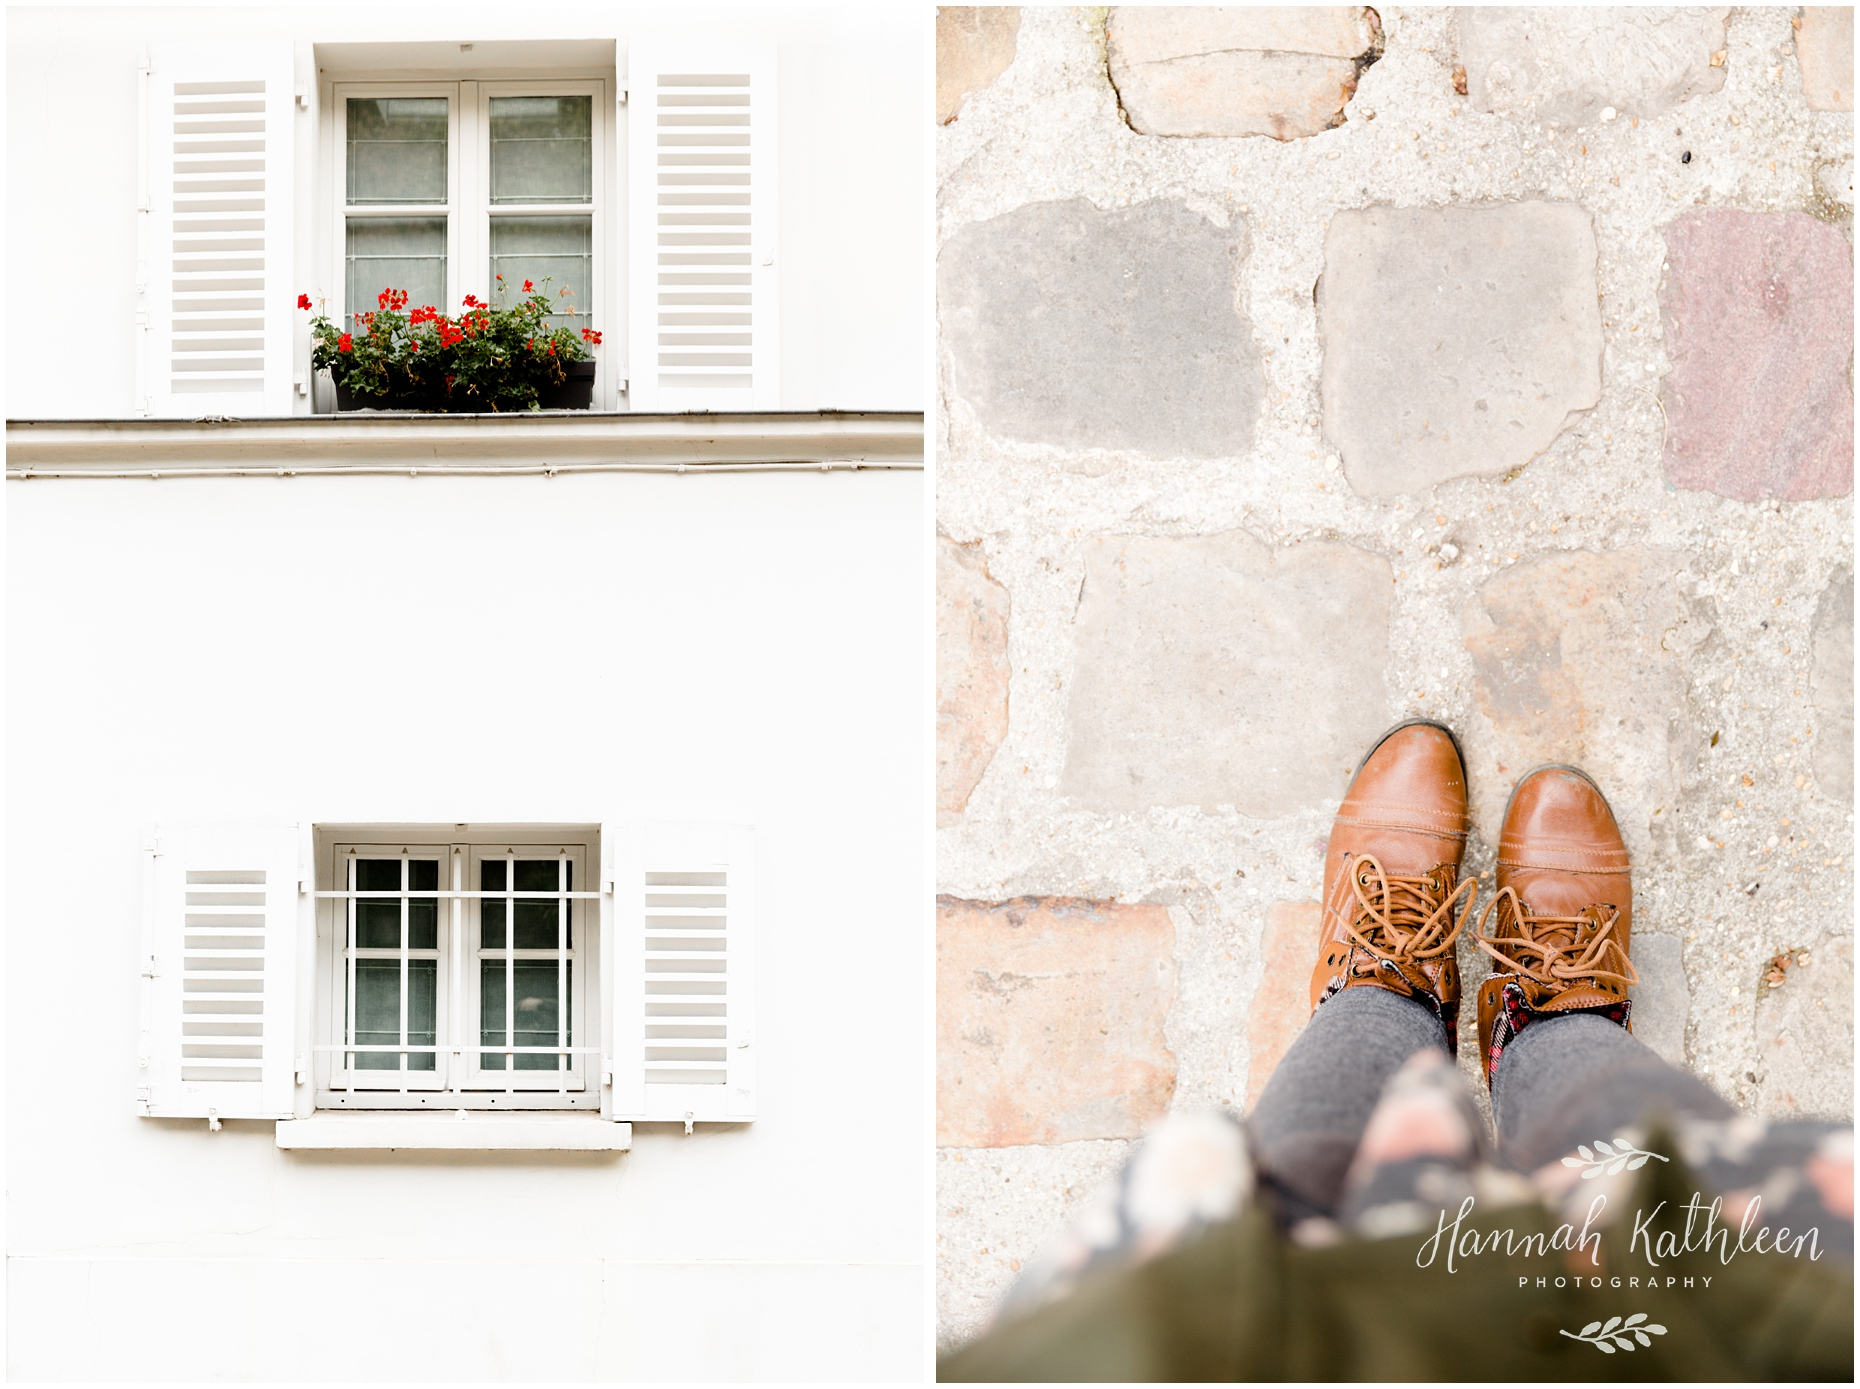 paris_france_eiffel_tower_trocadero_photography